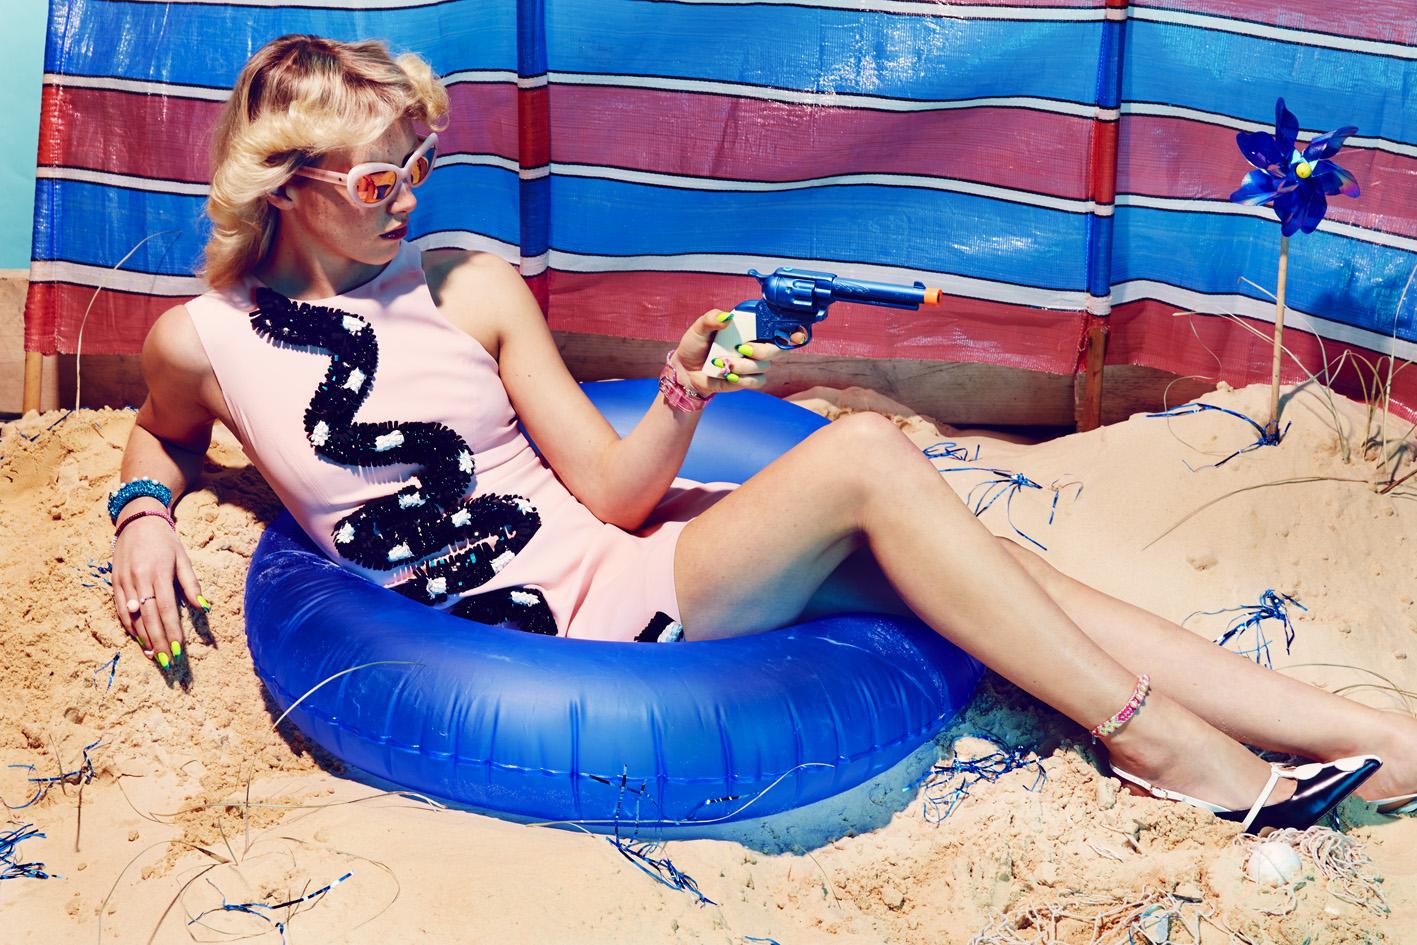 julia_kennedy_beach_baby_02.jpg